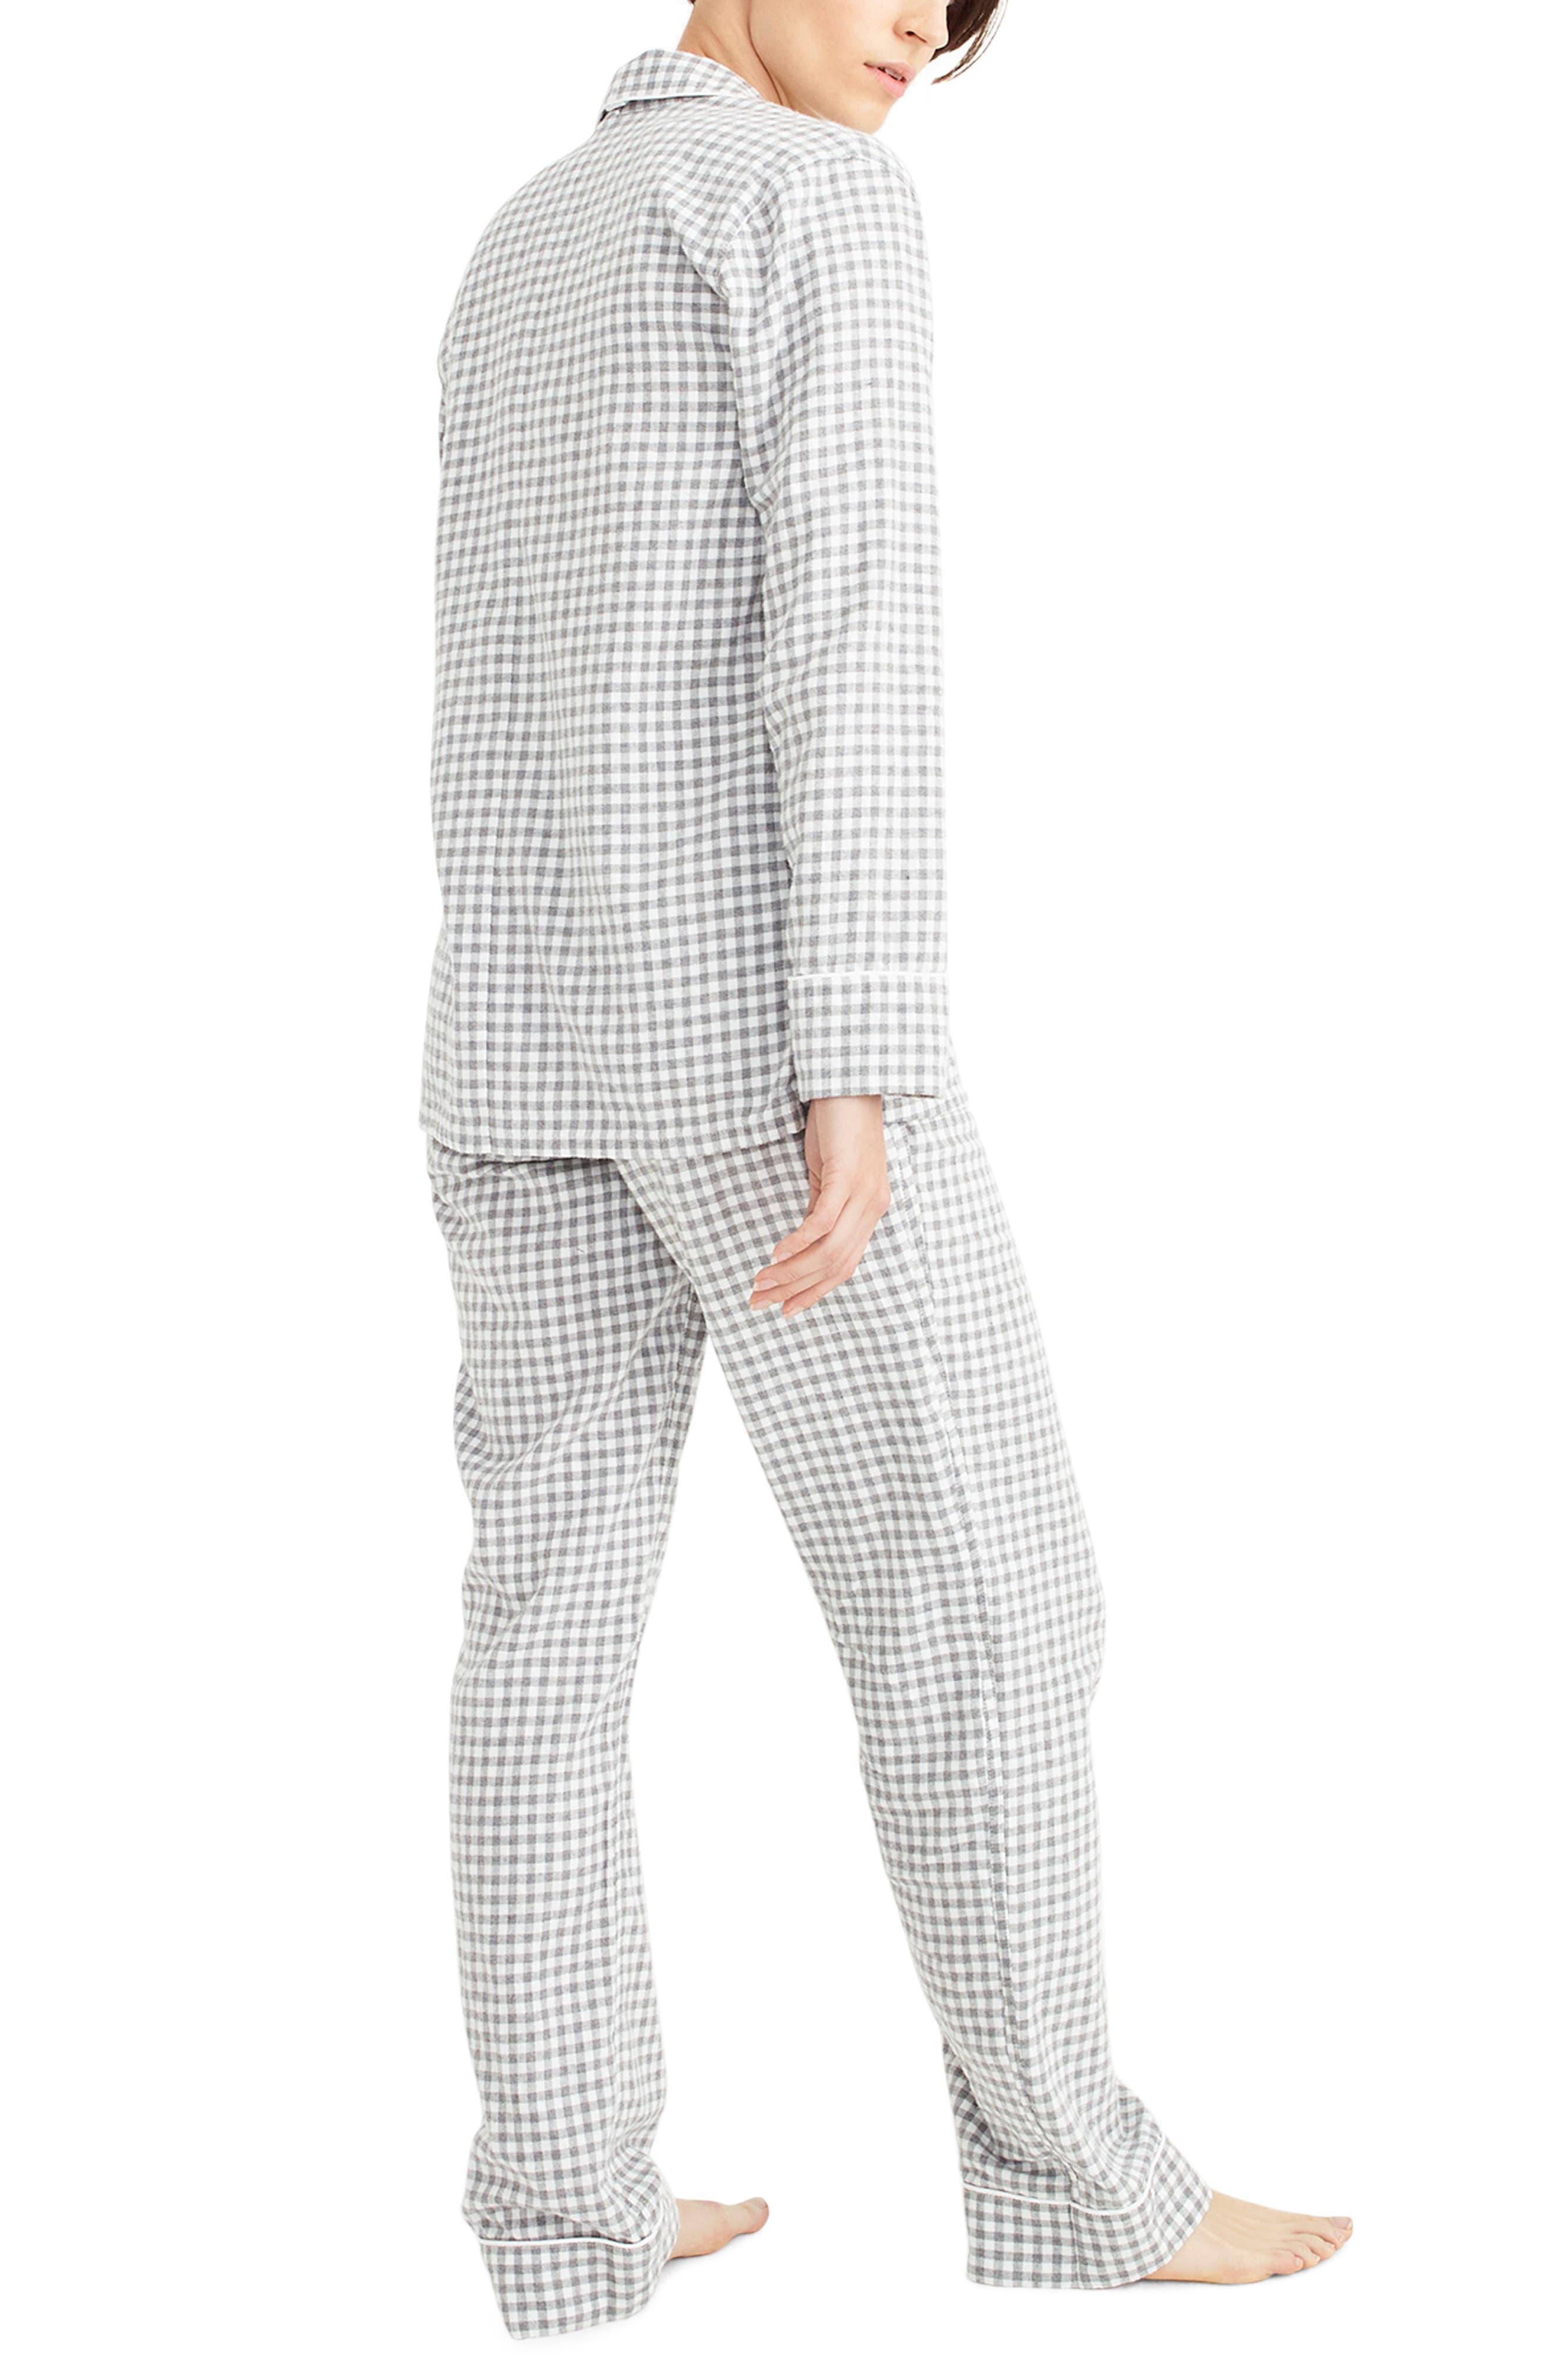 Gingham Flannel Pajamas,                             Alternate thumbnail 2, color,                             090